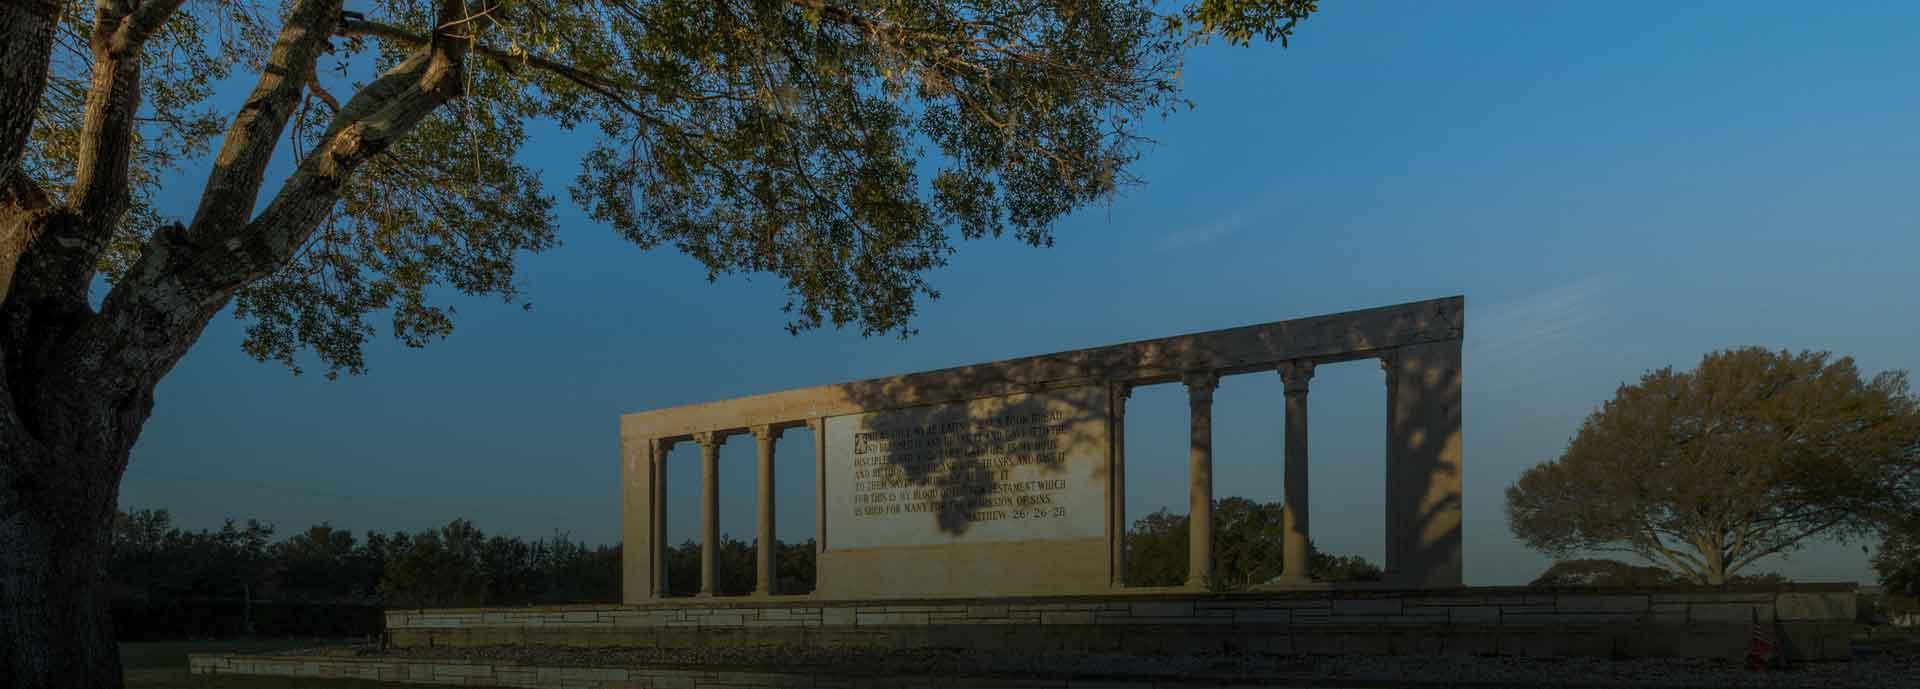 Skyway Memorial Park & Funeral Home - North Palmetto, FL